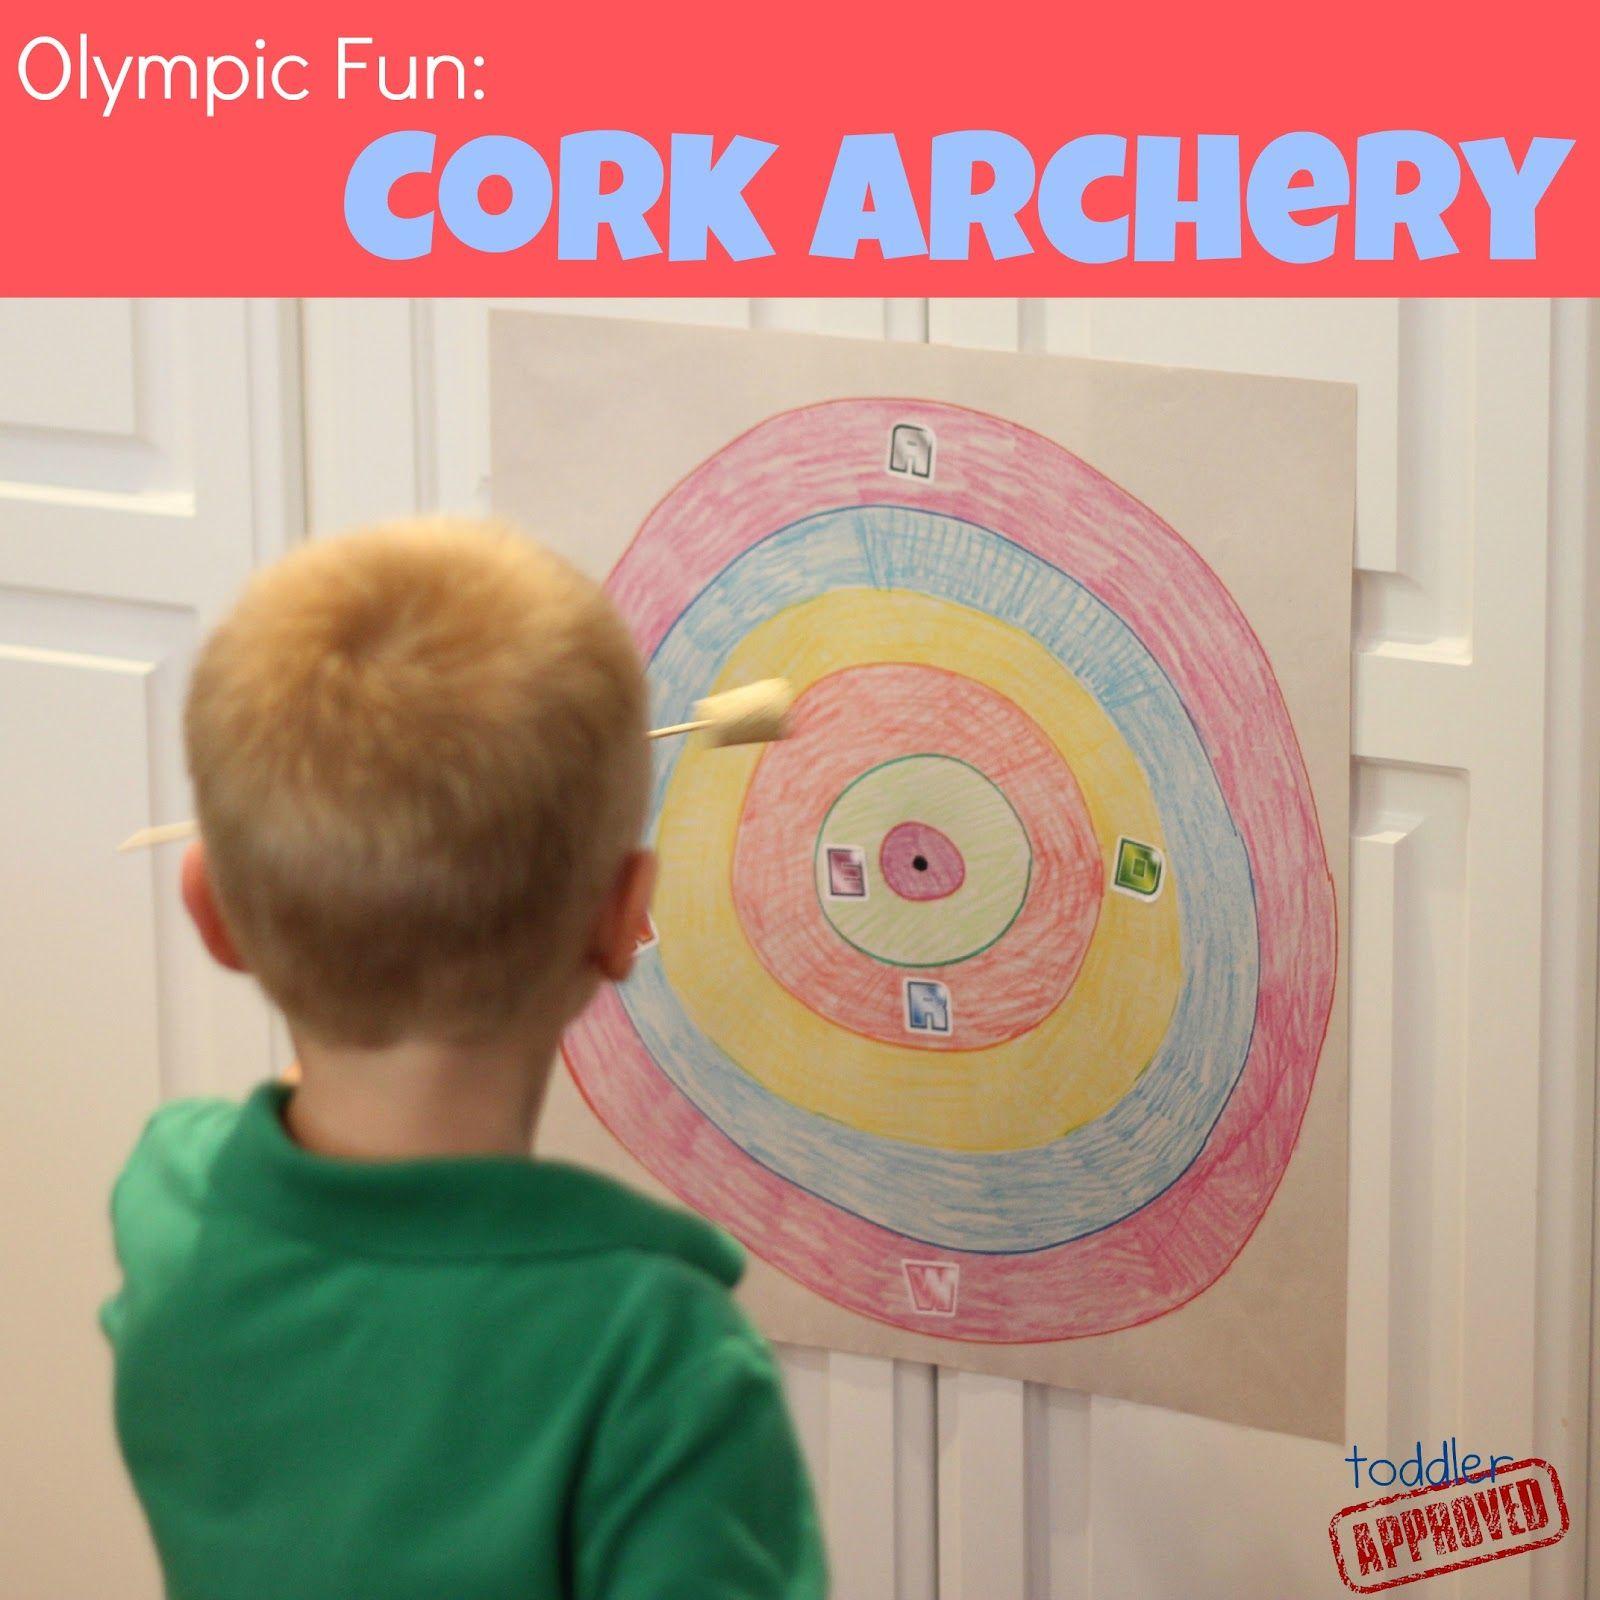 Olympic Fun: Cork Archery